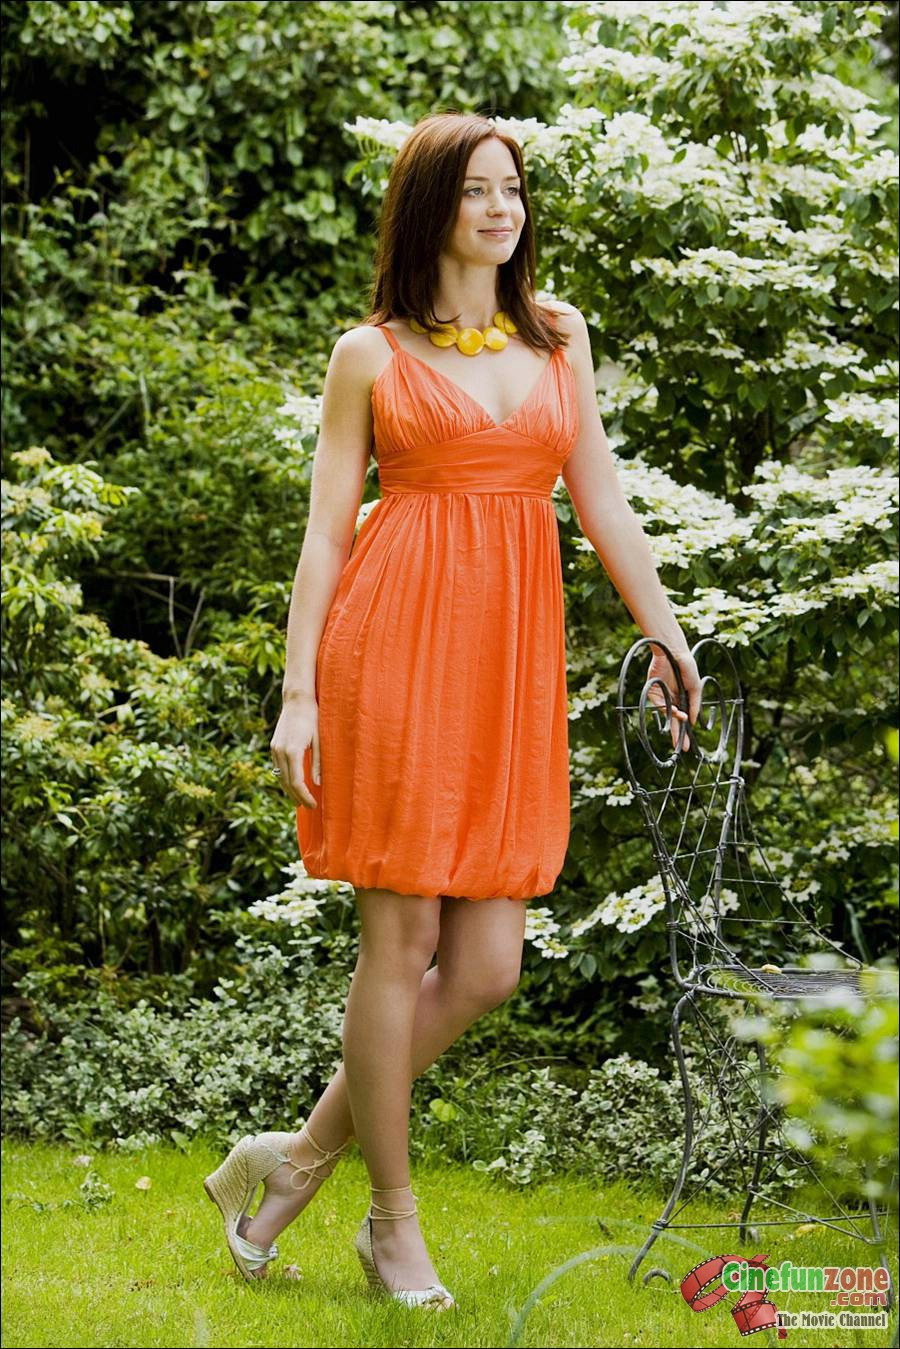 pics Emily blunt sexy